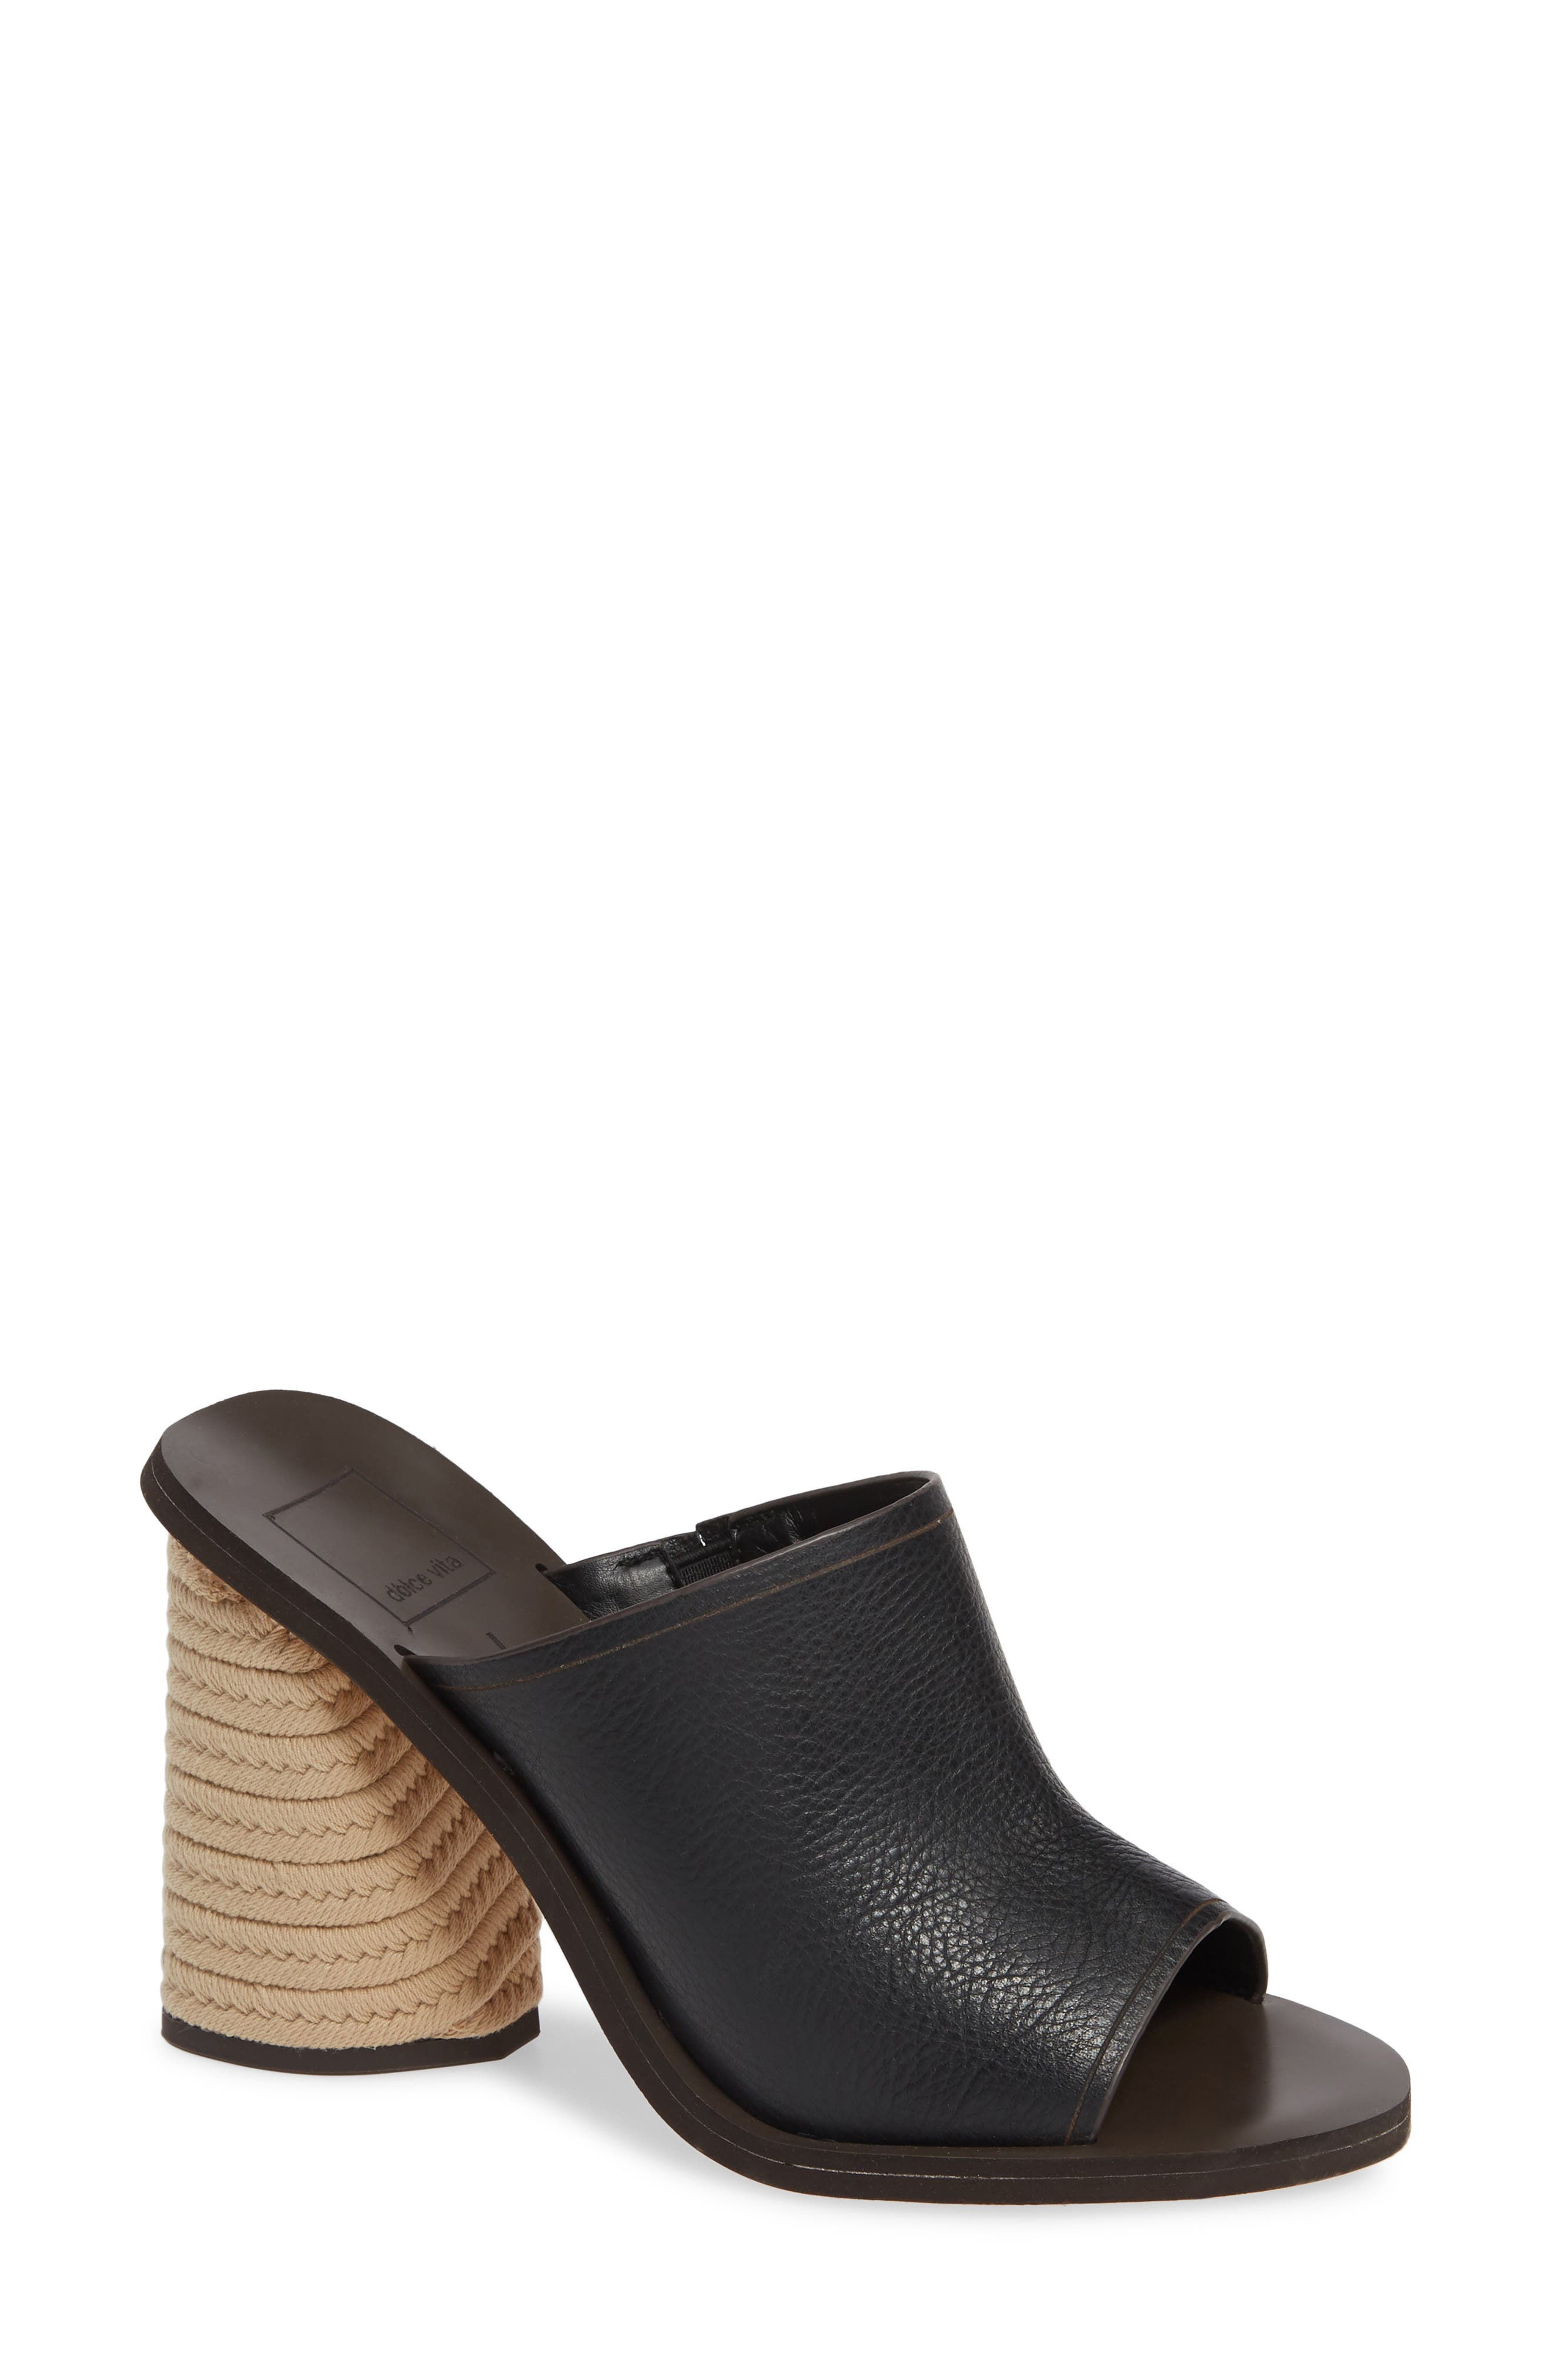 DOLCE VITA, Alba Braided Heel Mule Sandal, Main thumbnail 1, color, BLACK LEATHER